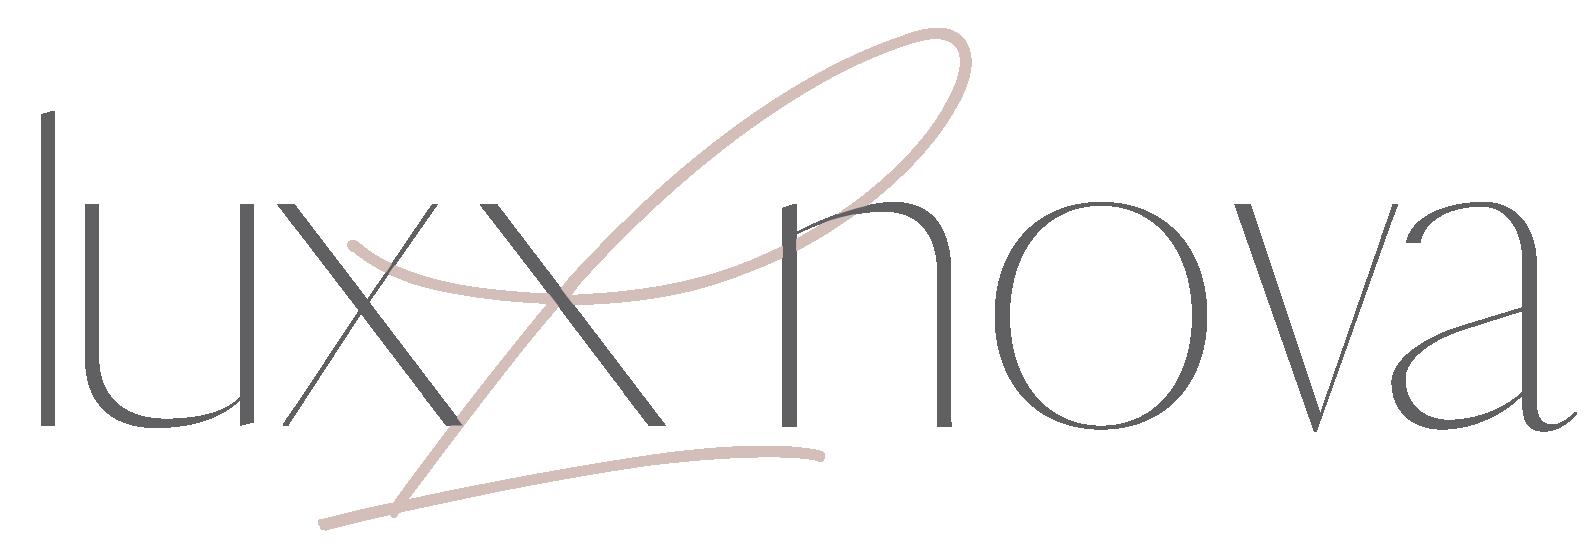 Wedding Dresses Online Store  |  Luxx Nova